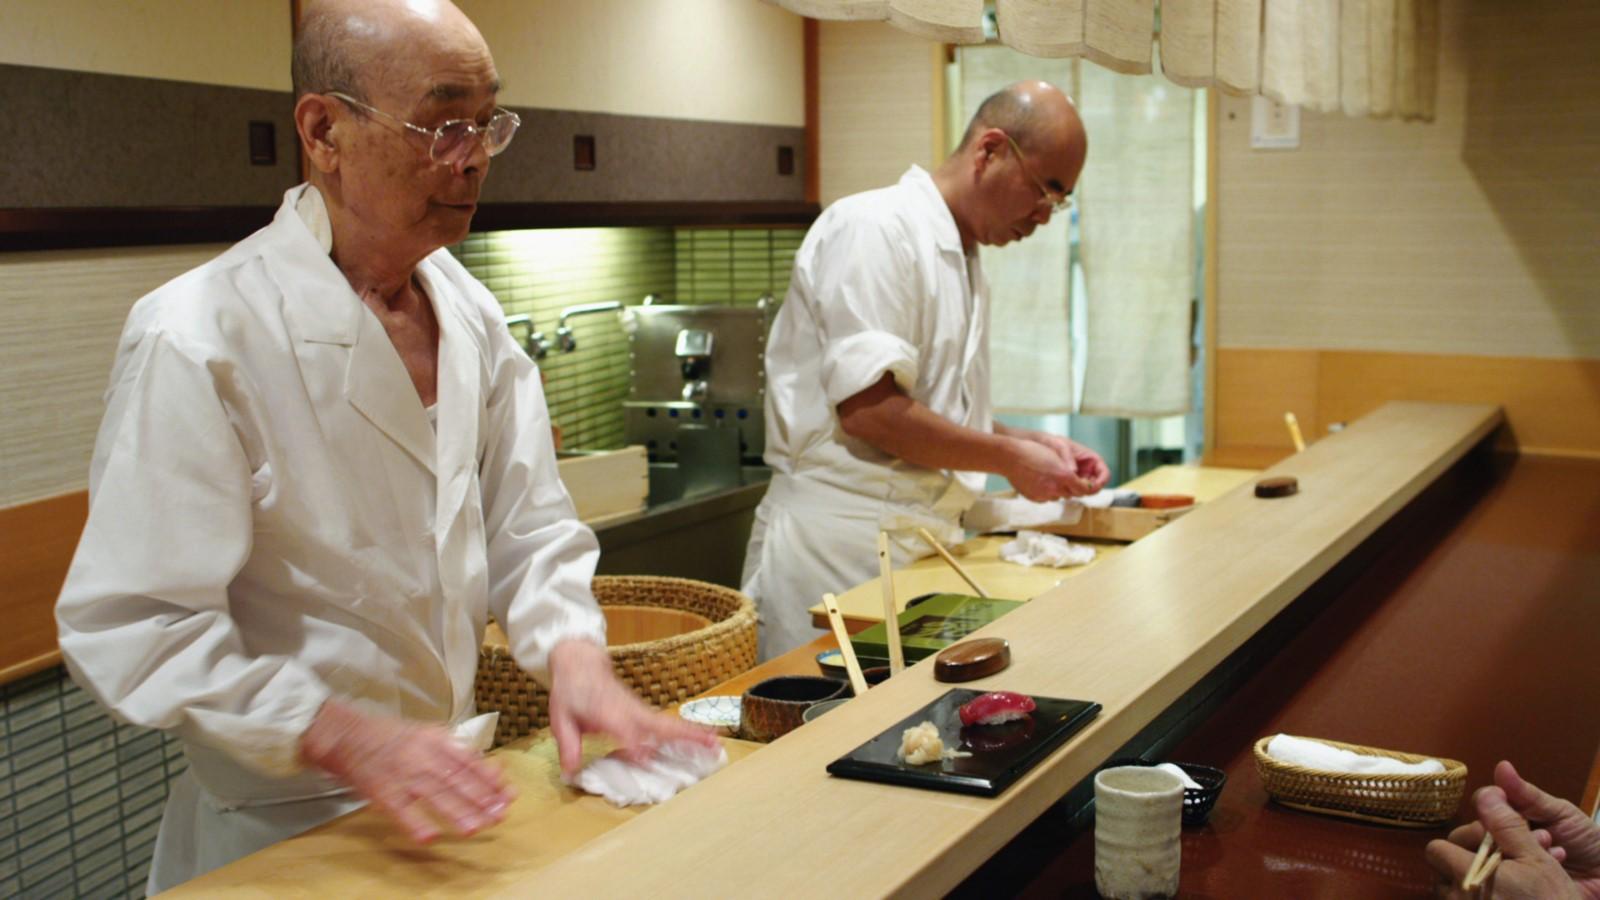 Jiro Ono, the creator of Sukiyabashi Jiro, is the greatest sushi chef in the world. His restaurant seats 9 people.